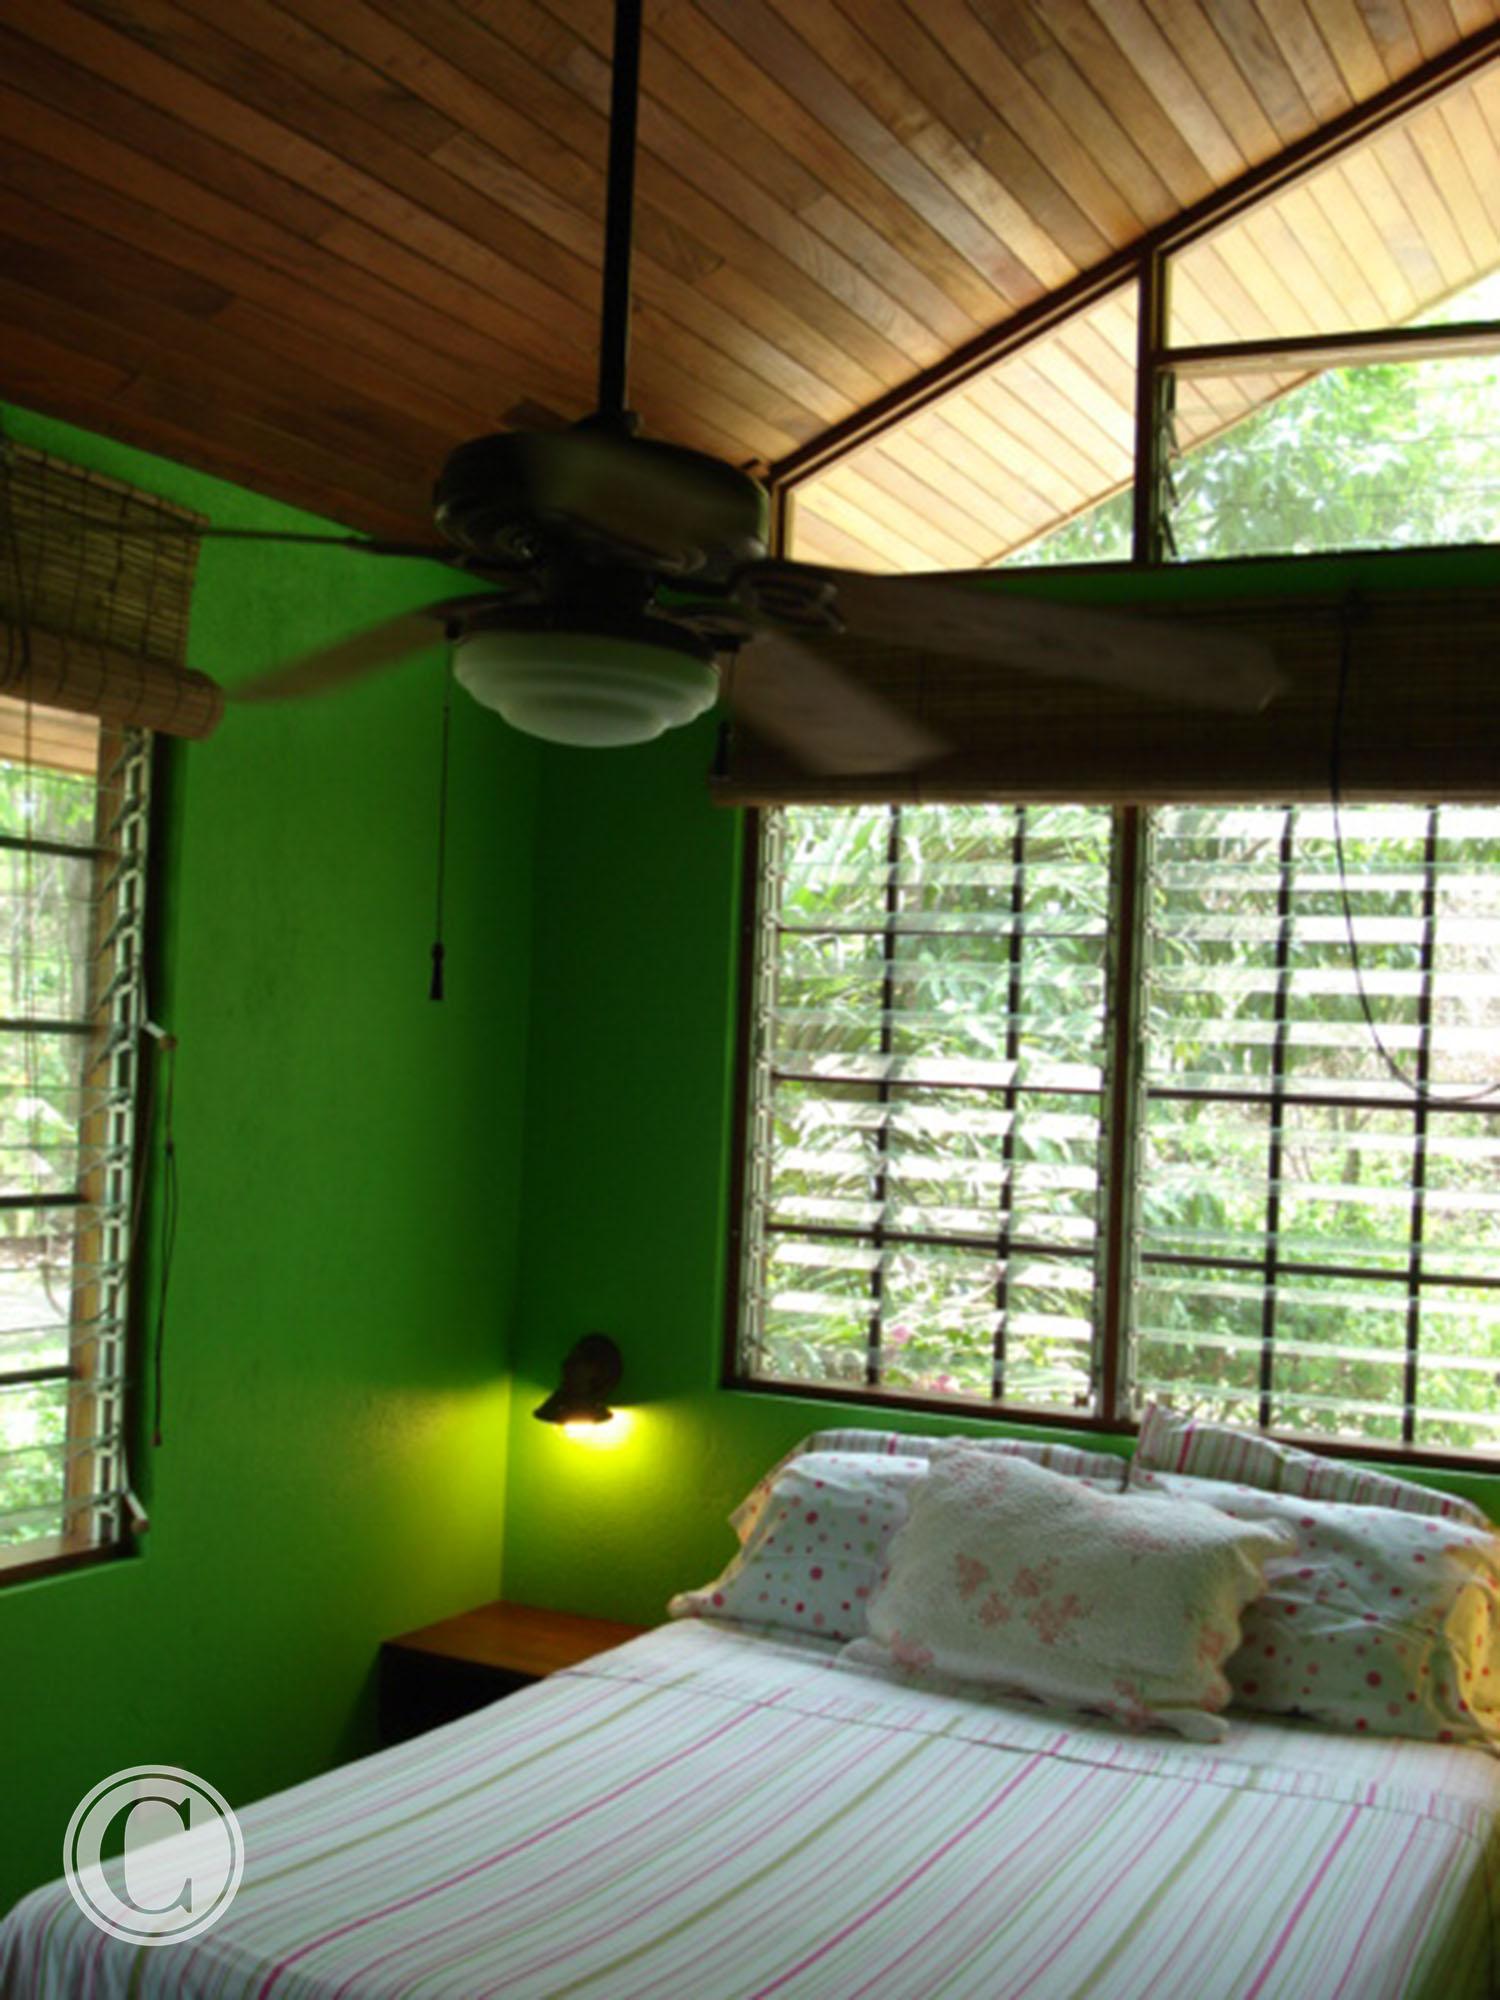 bedrooms-costa-rica-cornelius-construction (3) copy.jpg